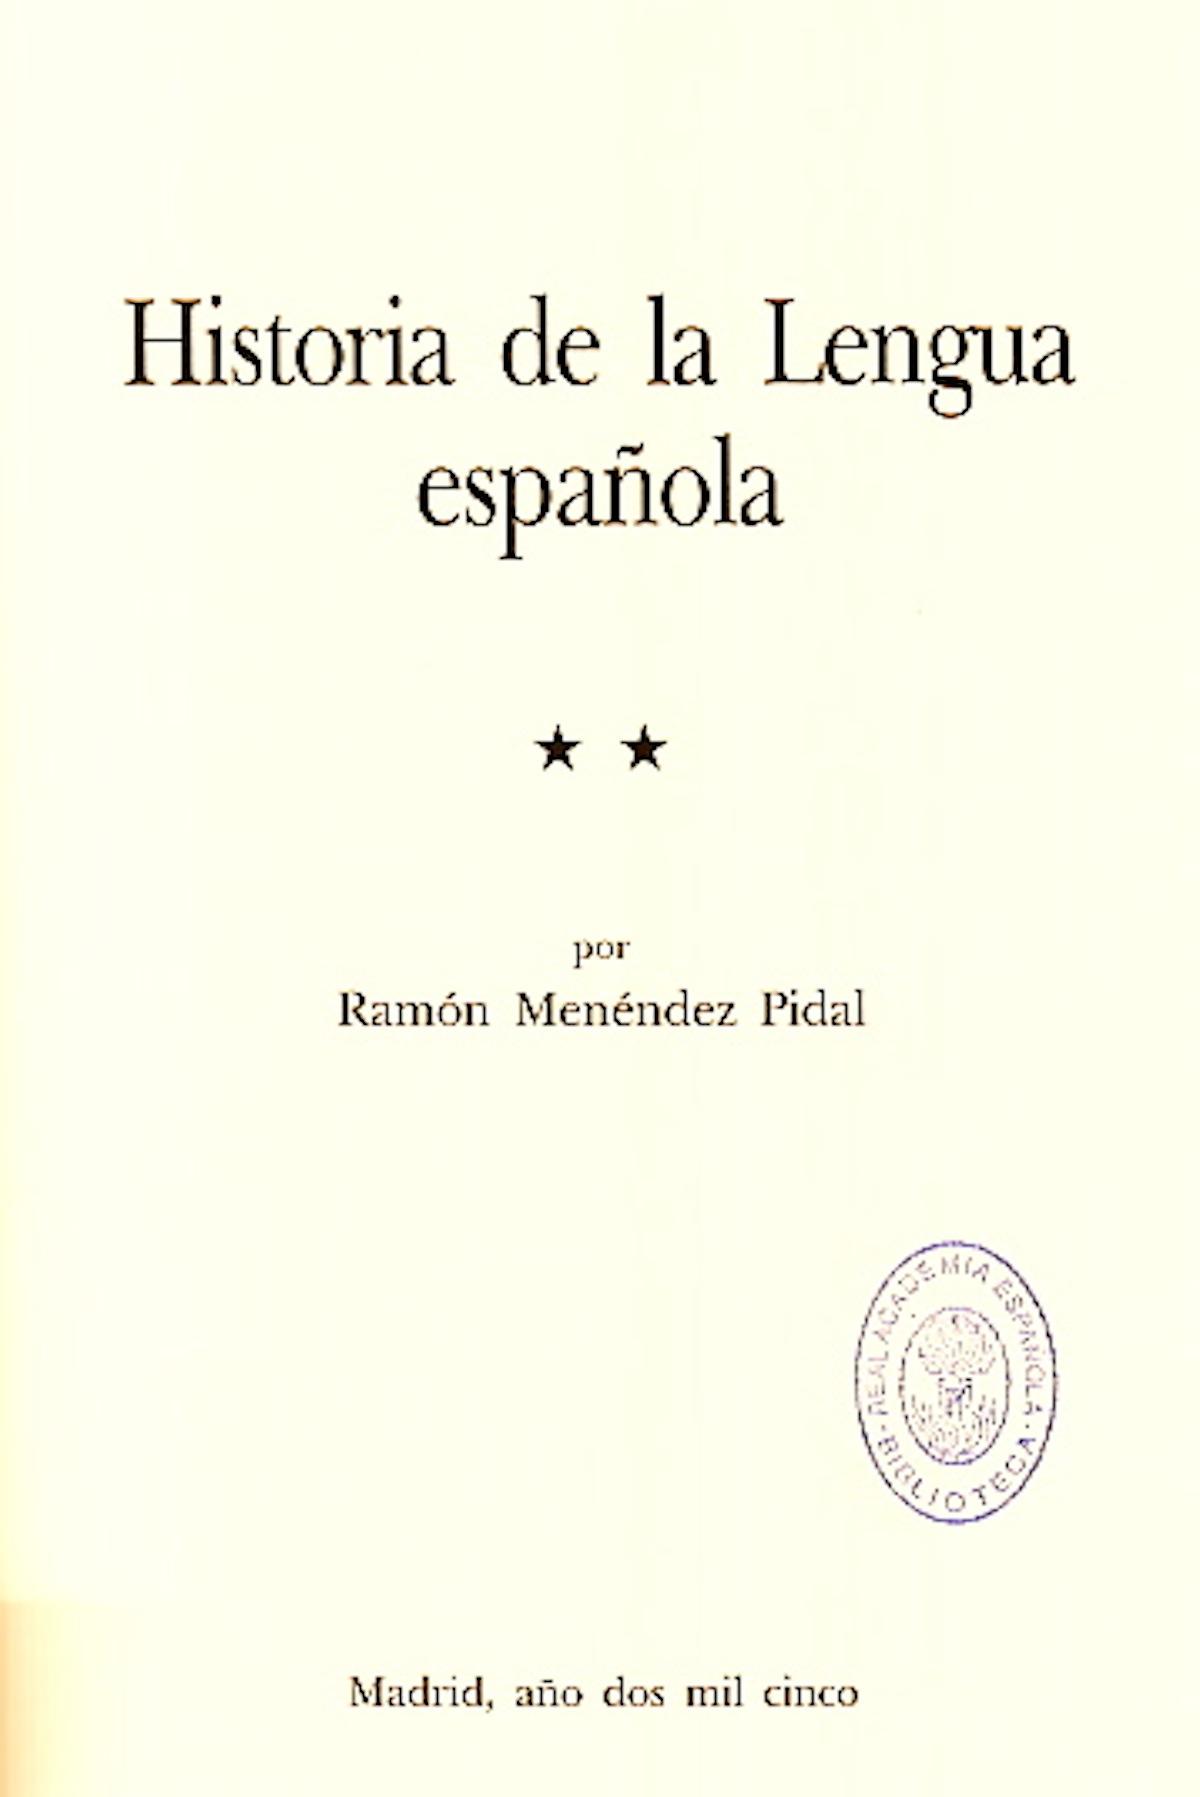 Historia De La Lengua Espanola Real Academia Espanola